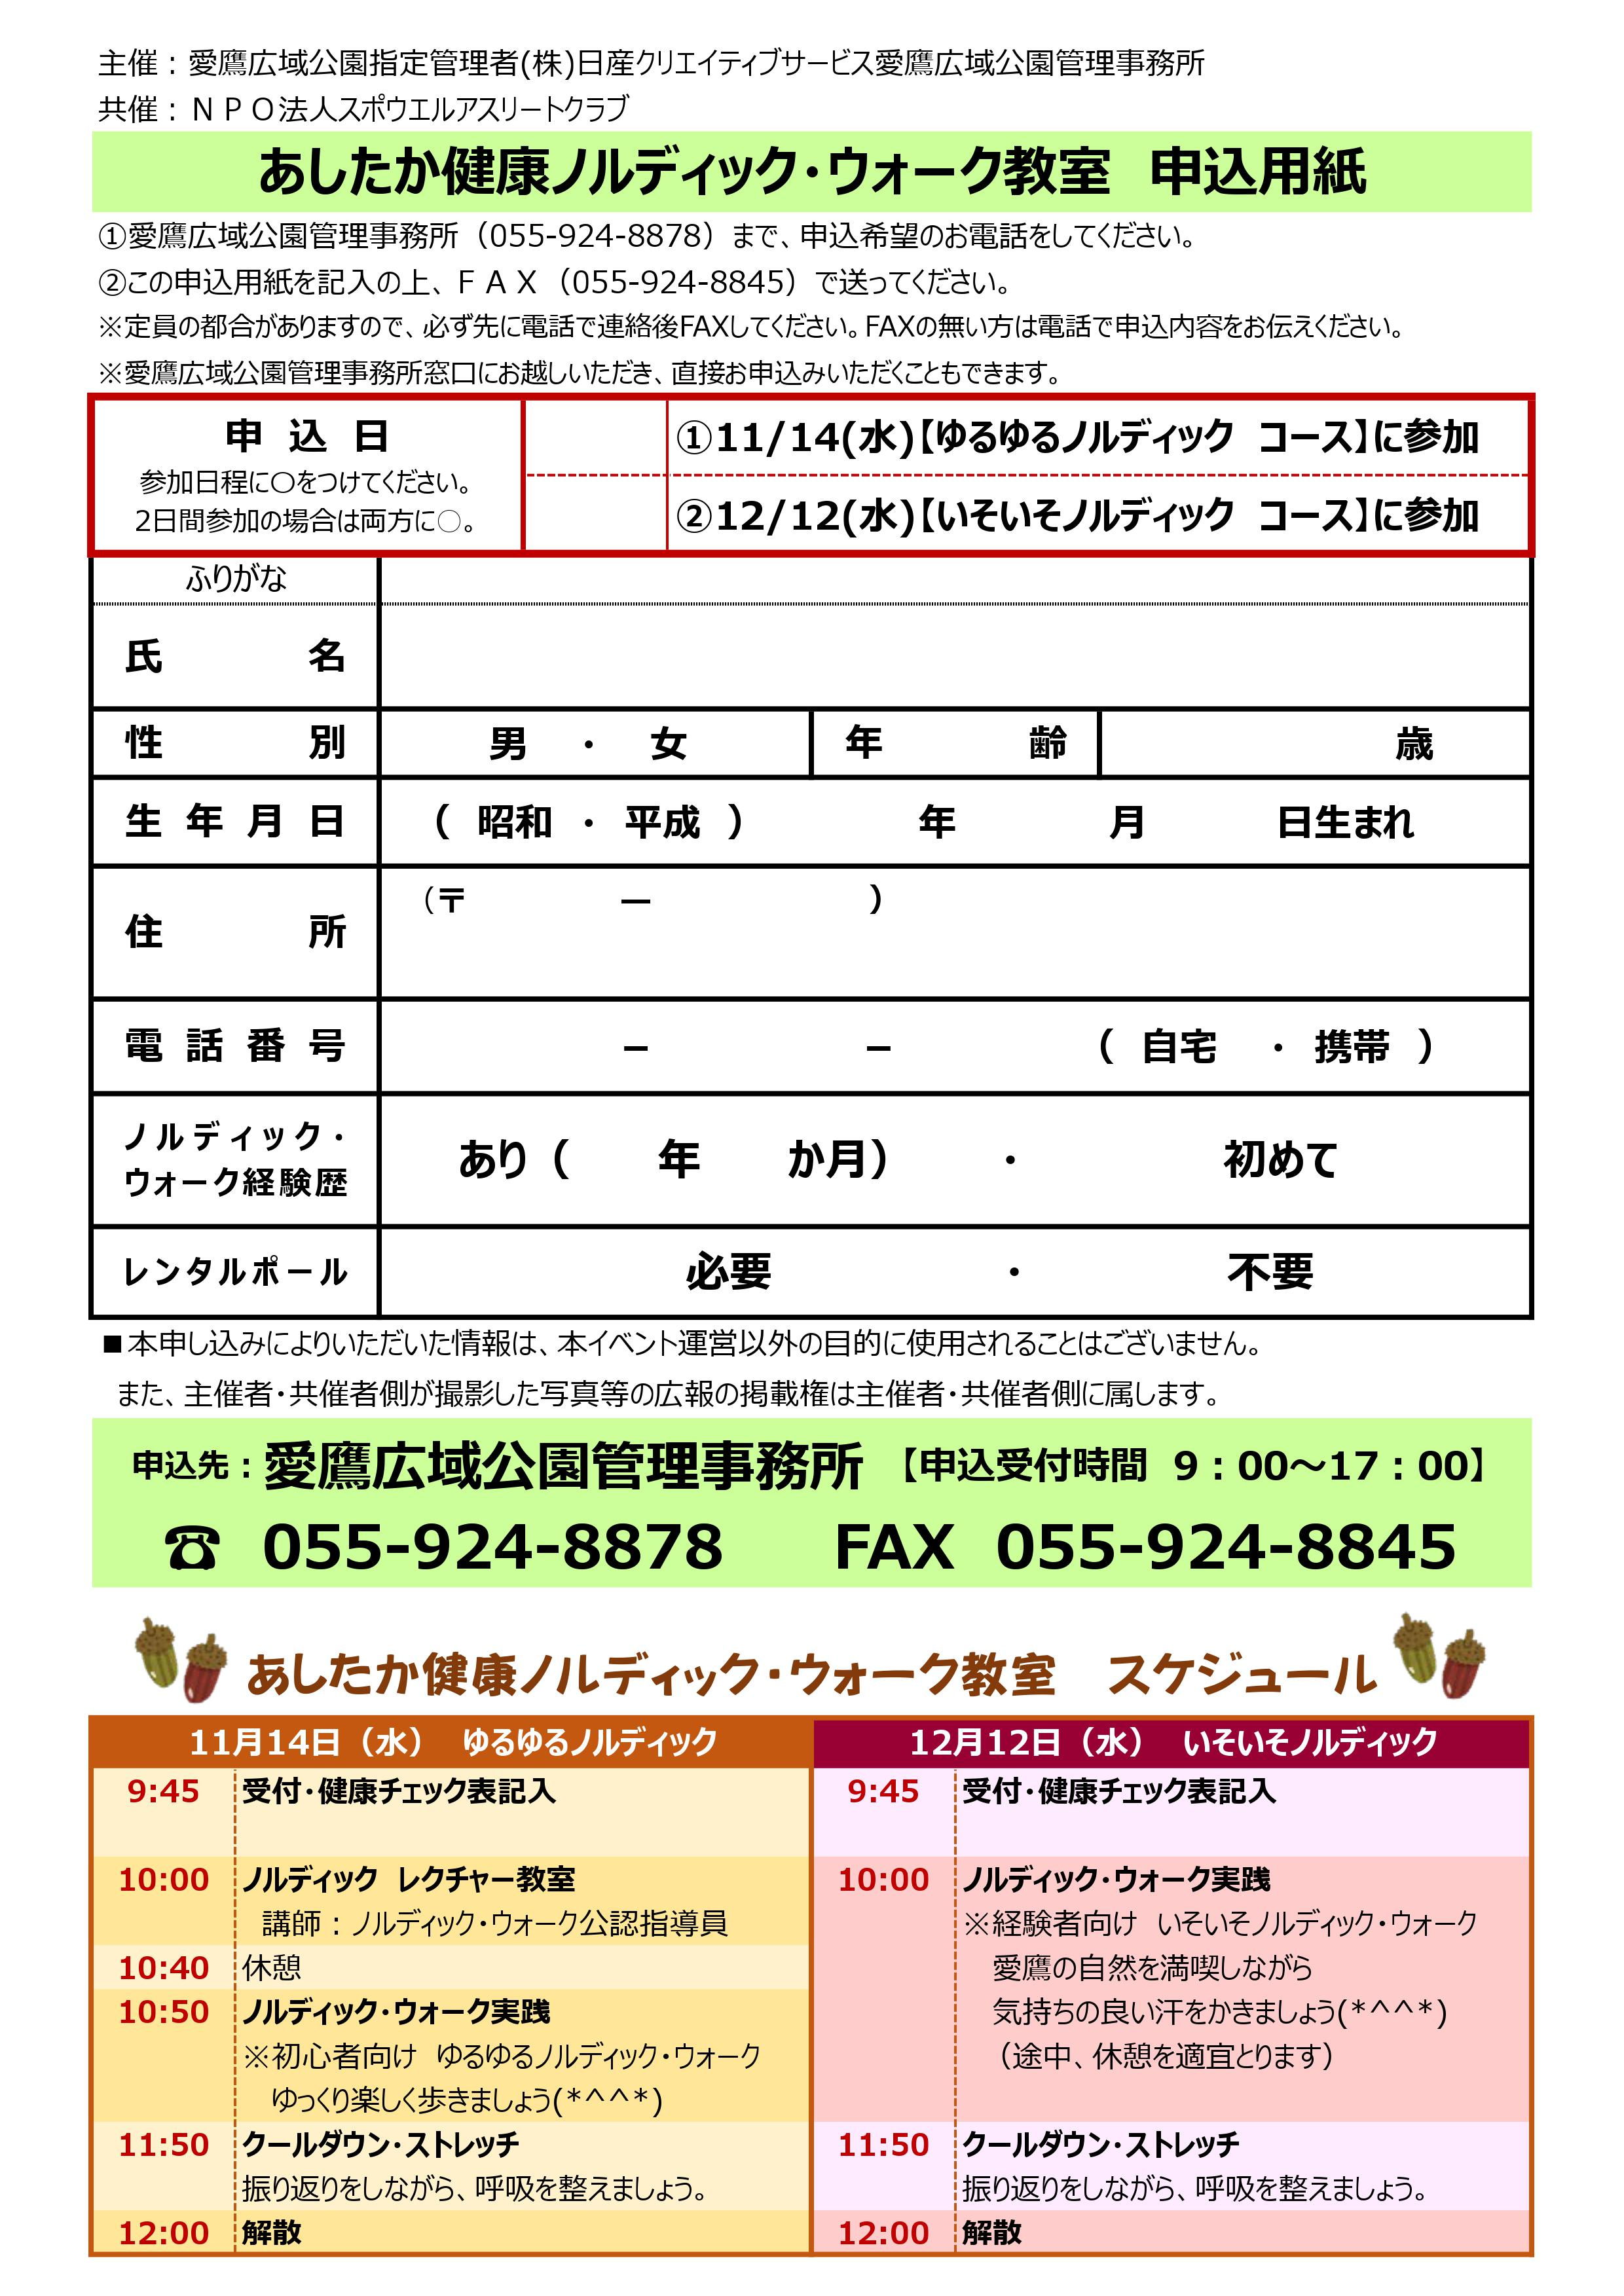 yuruyuruisoiso2018 form